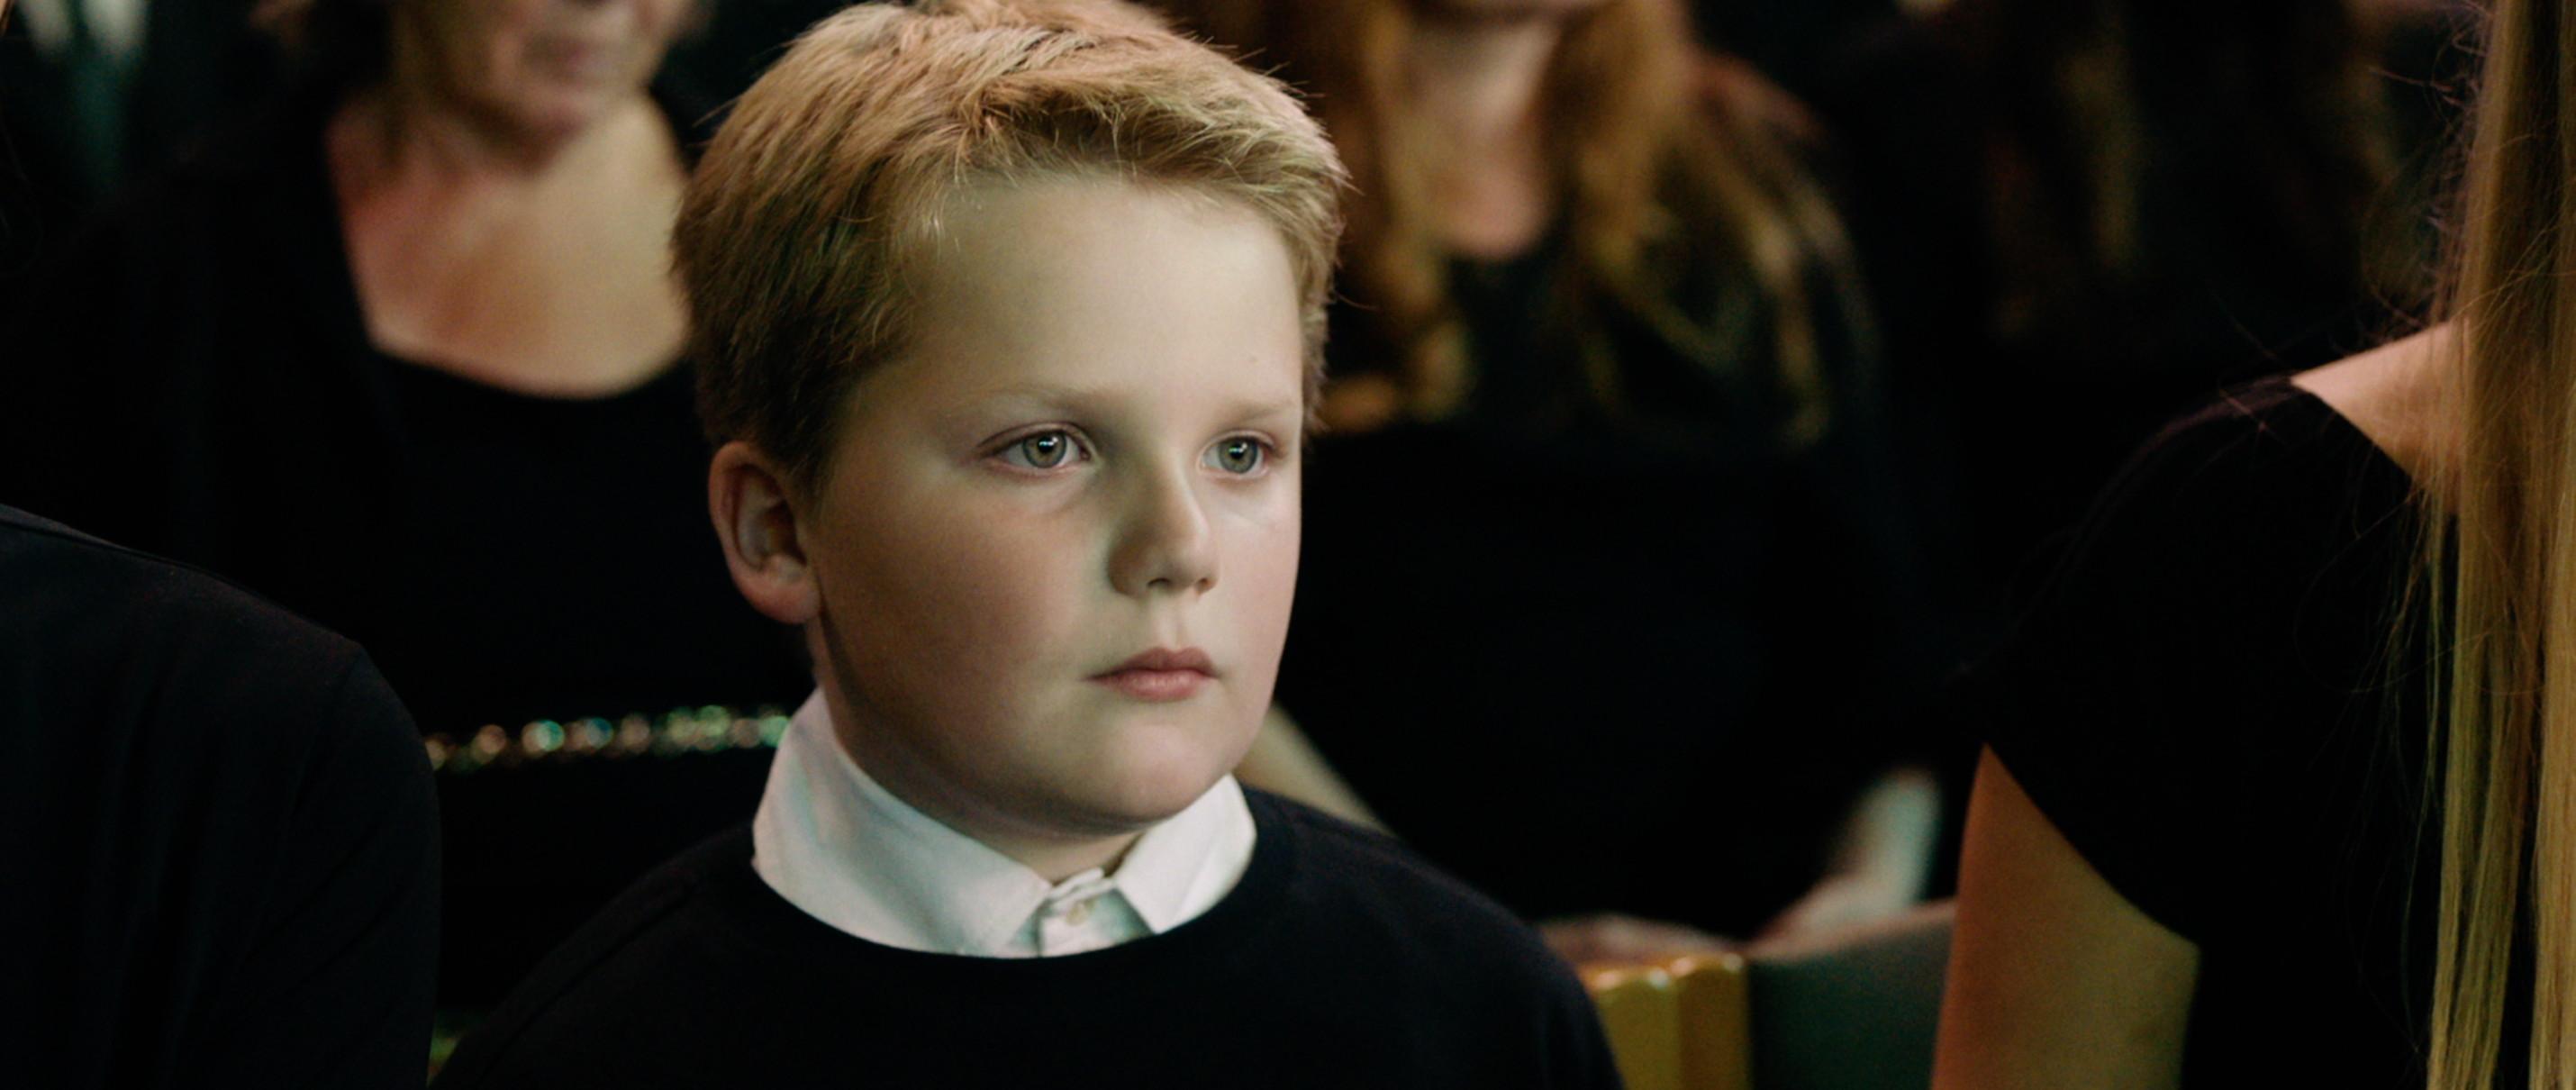 Der Junge muss an die frische Luft - all about me - Hapes depressive Mutter begeht Suizid - Regie Caroline Link - Kamera Judith Kaufmann